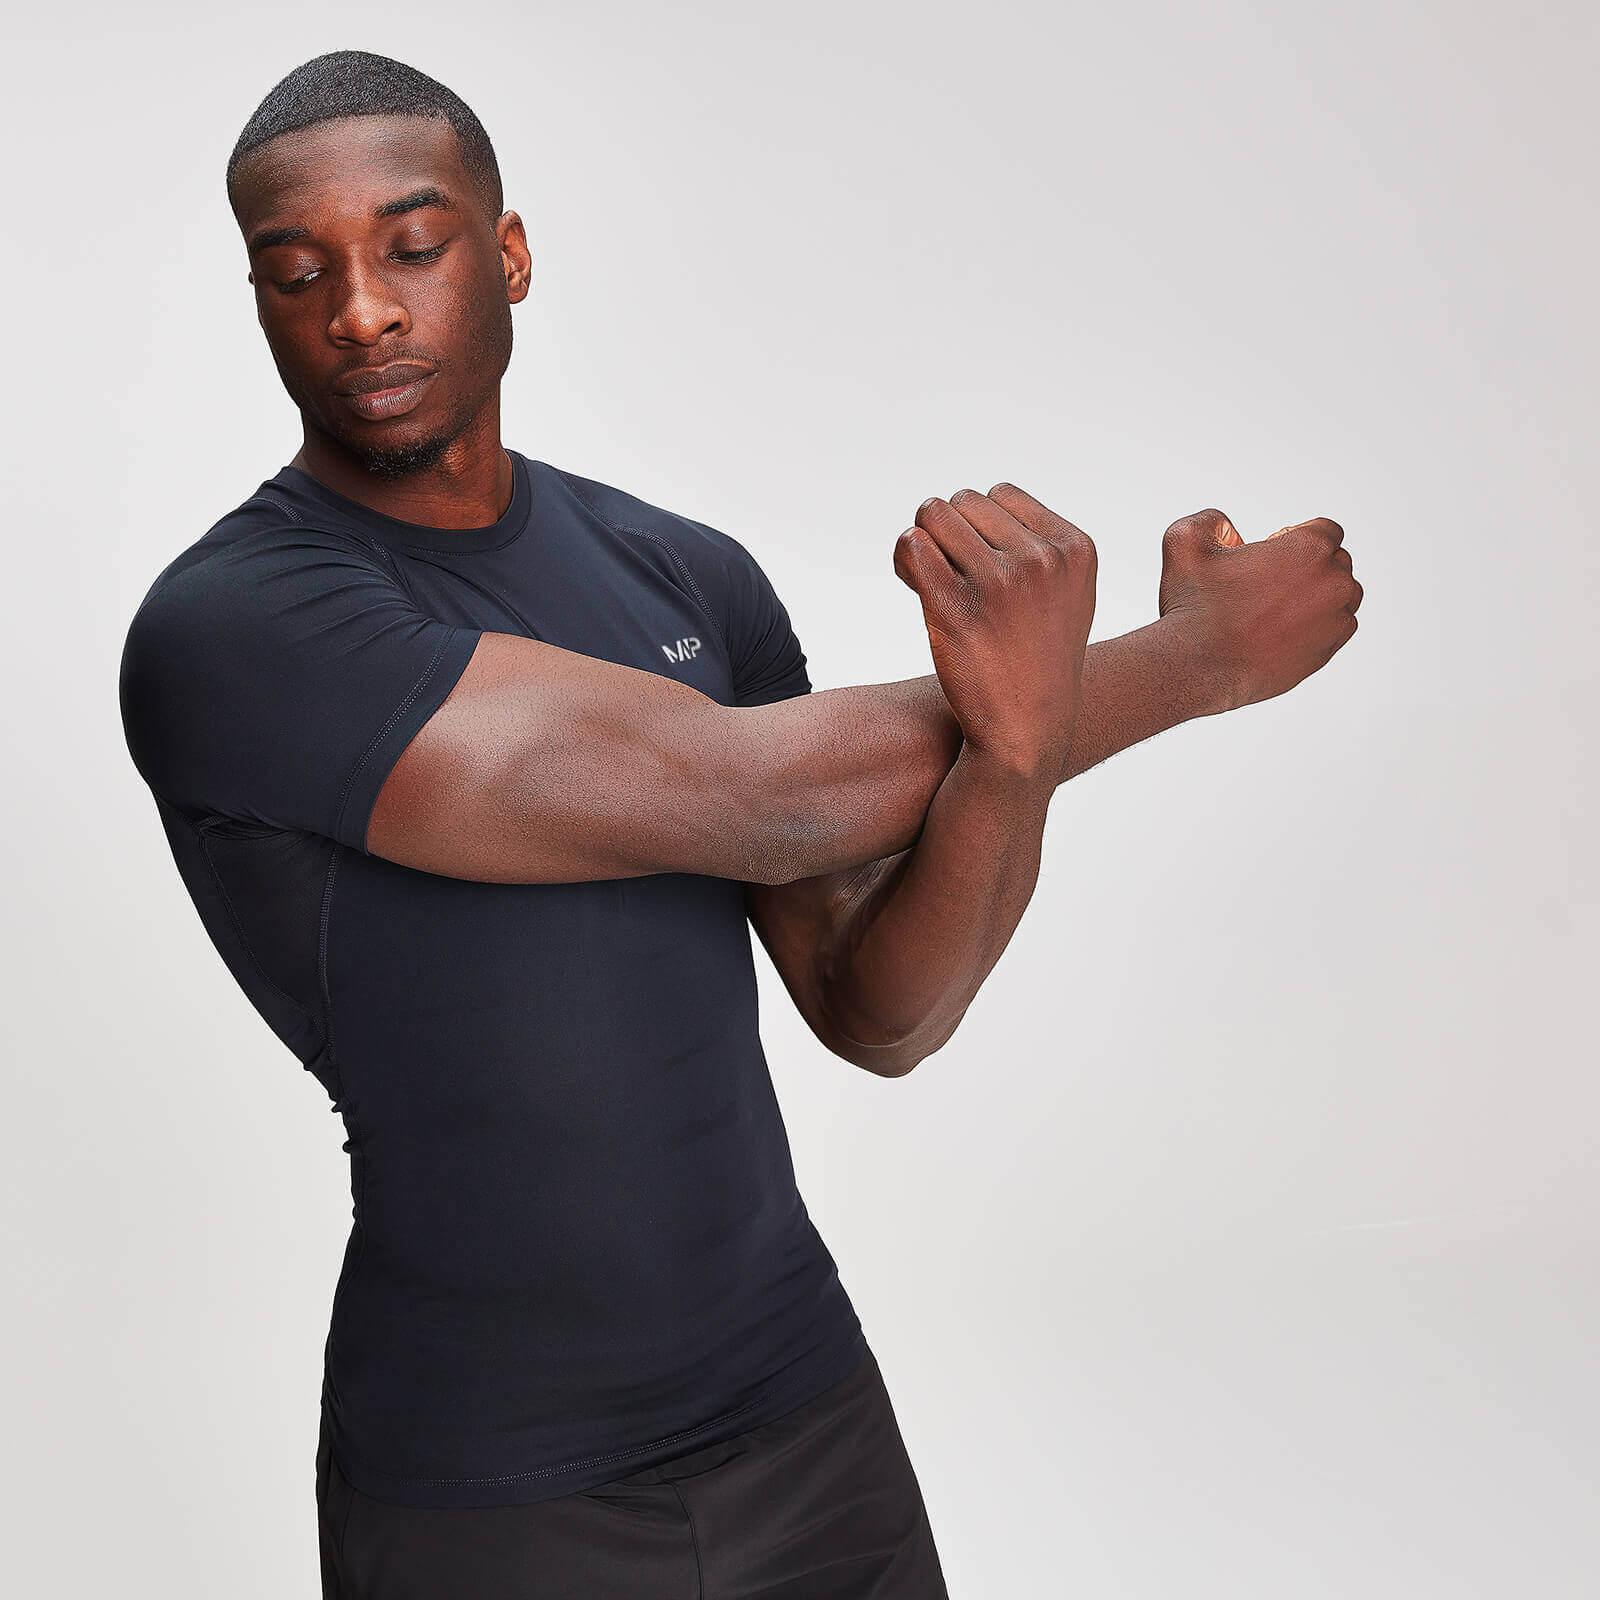 Купить Мужская футболка MP Base Layer с коротким рукавом, черная - XS, Myprotein International